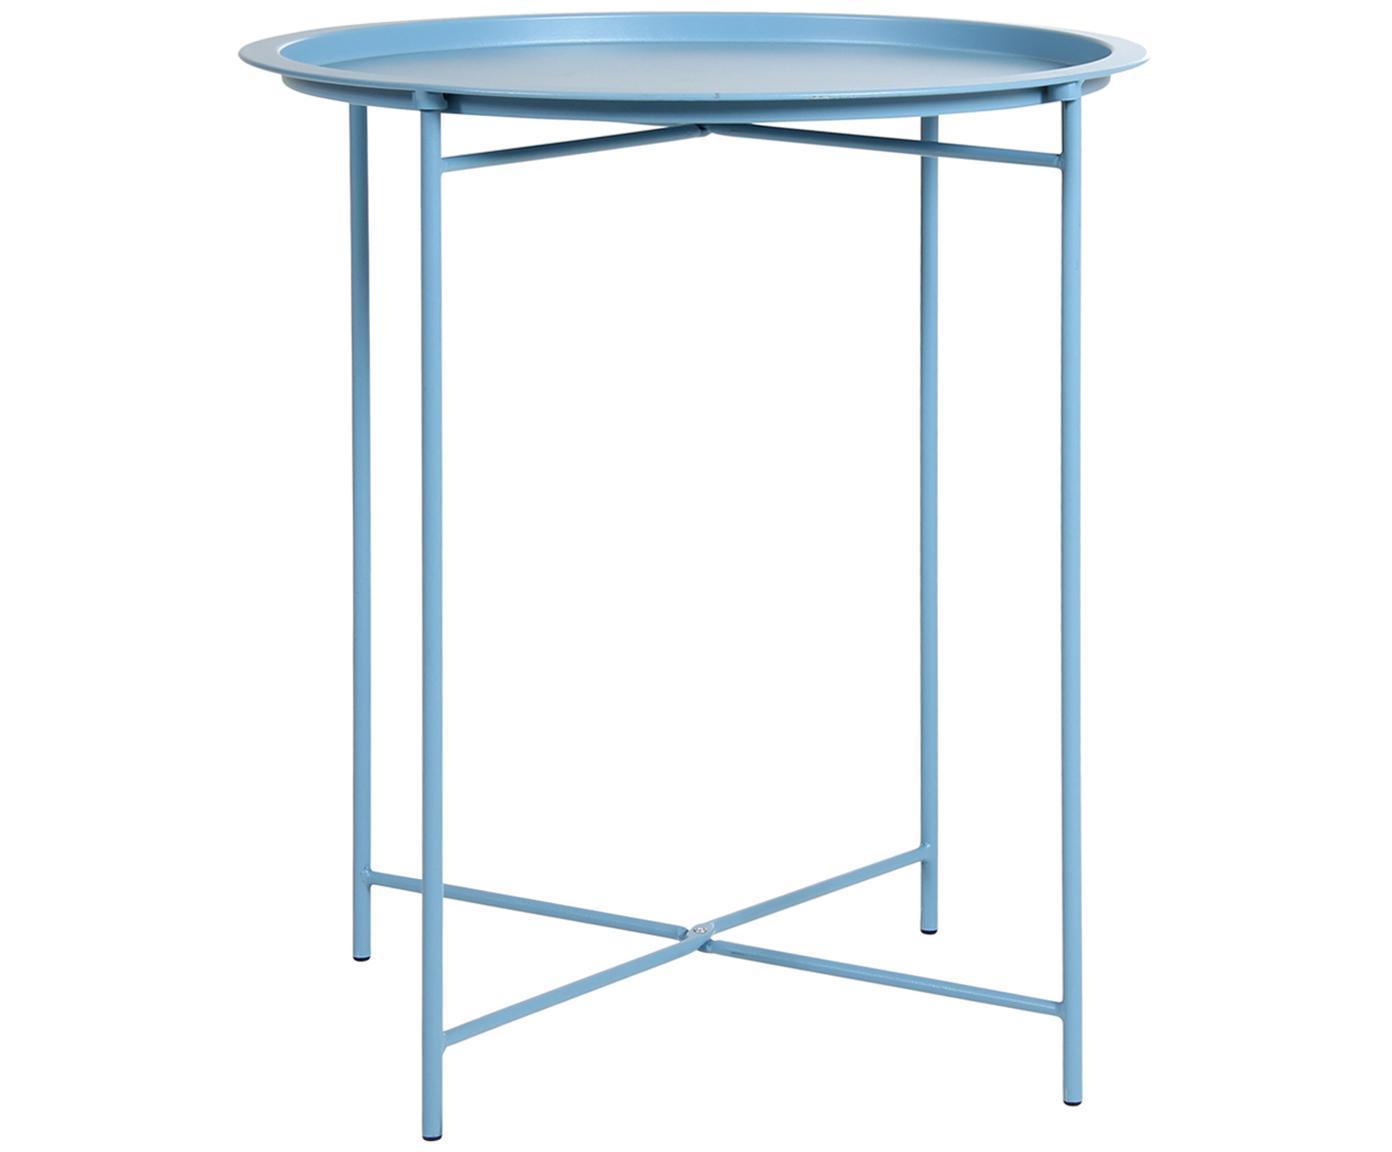 Tavolino-vassoio in metallo Sangro, Acciaio, verniciato, Blu, Ø 46 x Alt. 52 cm